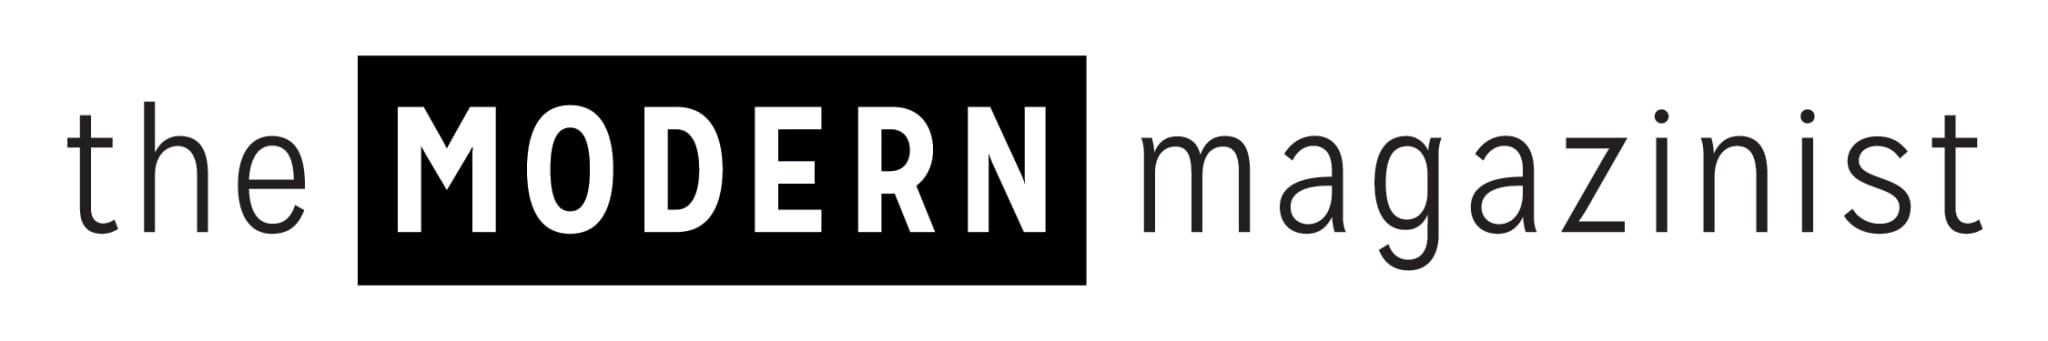 26150 Folio Modern Magazinist Logo